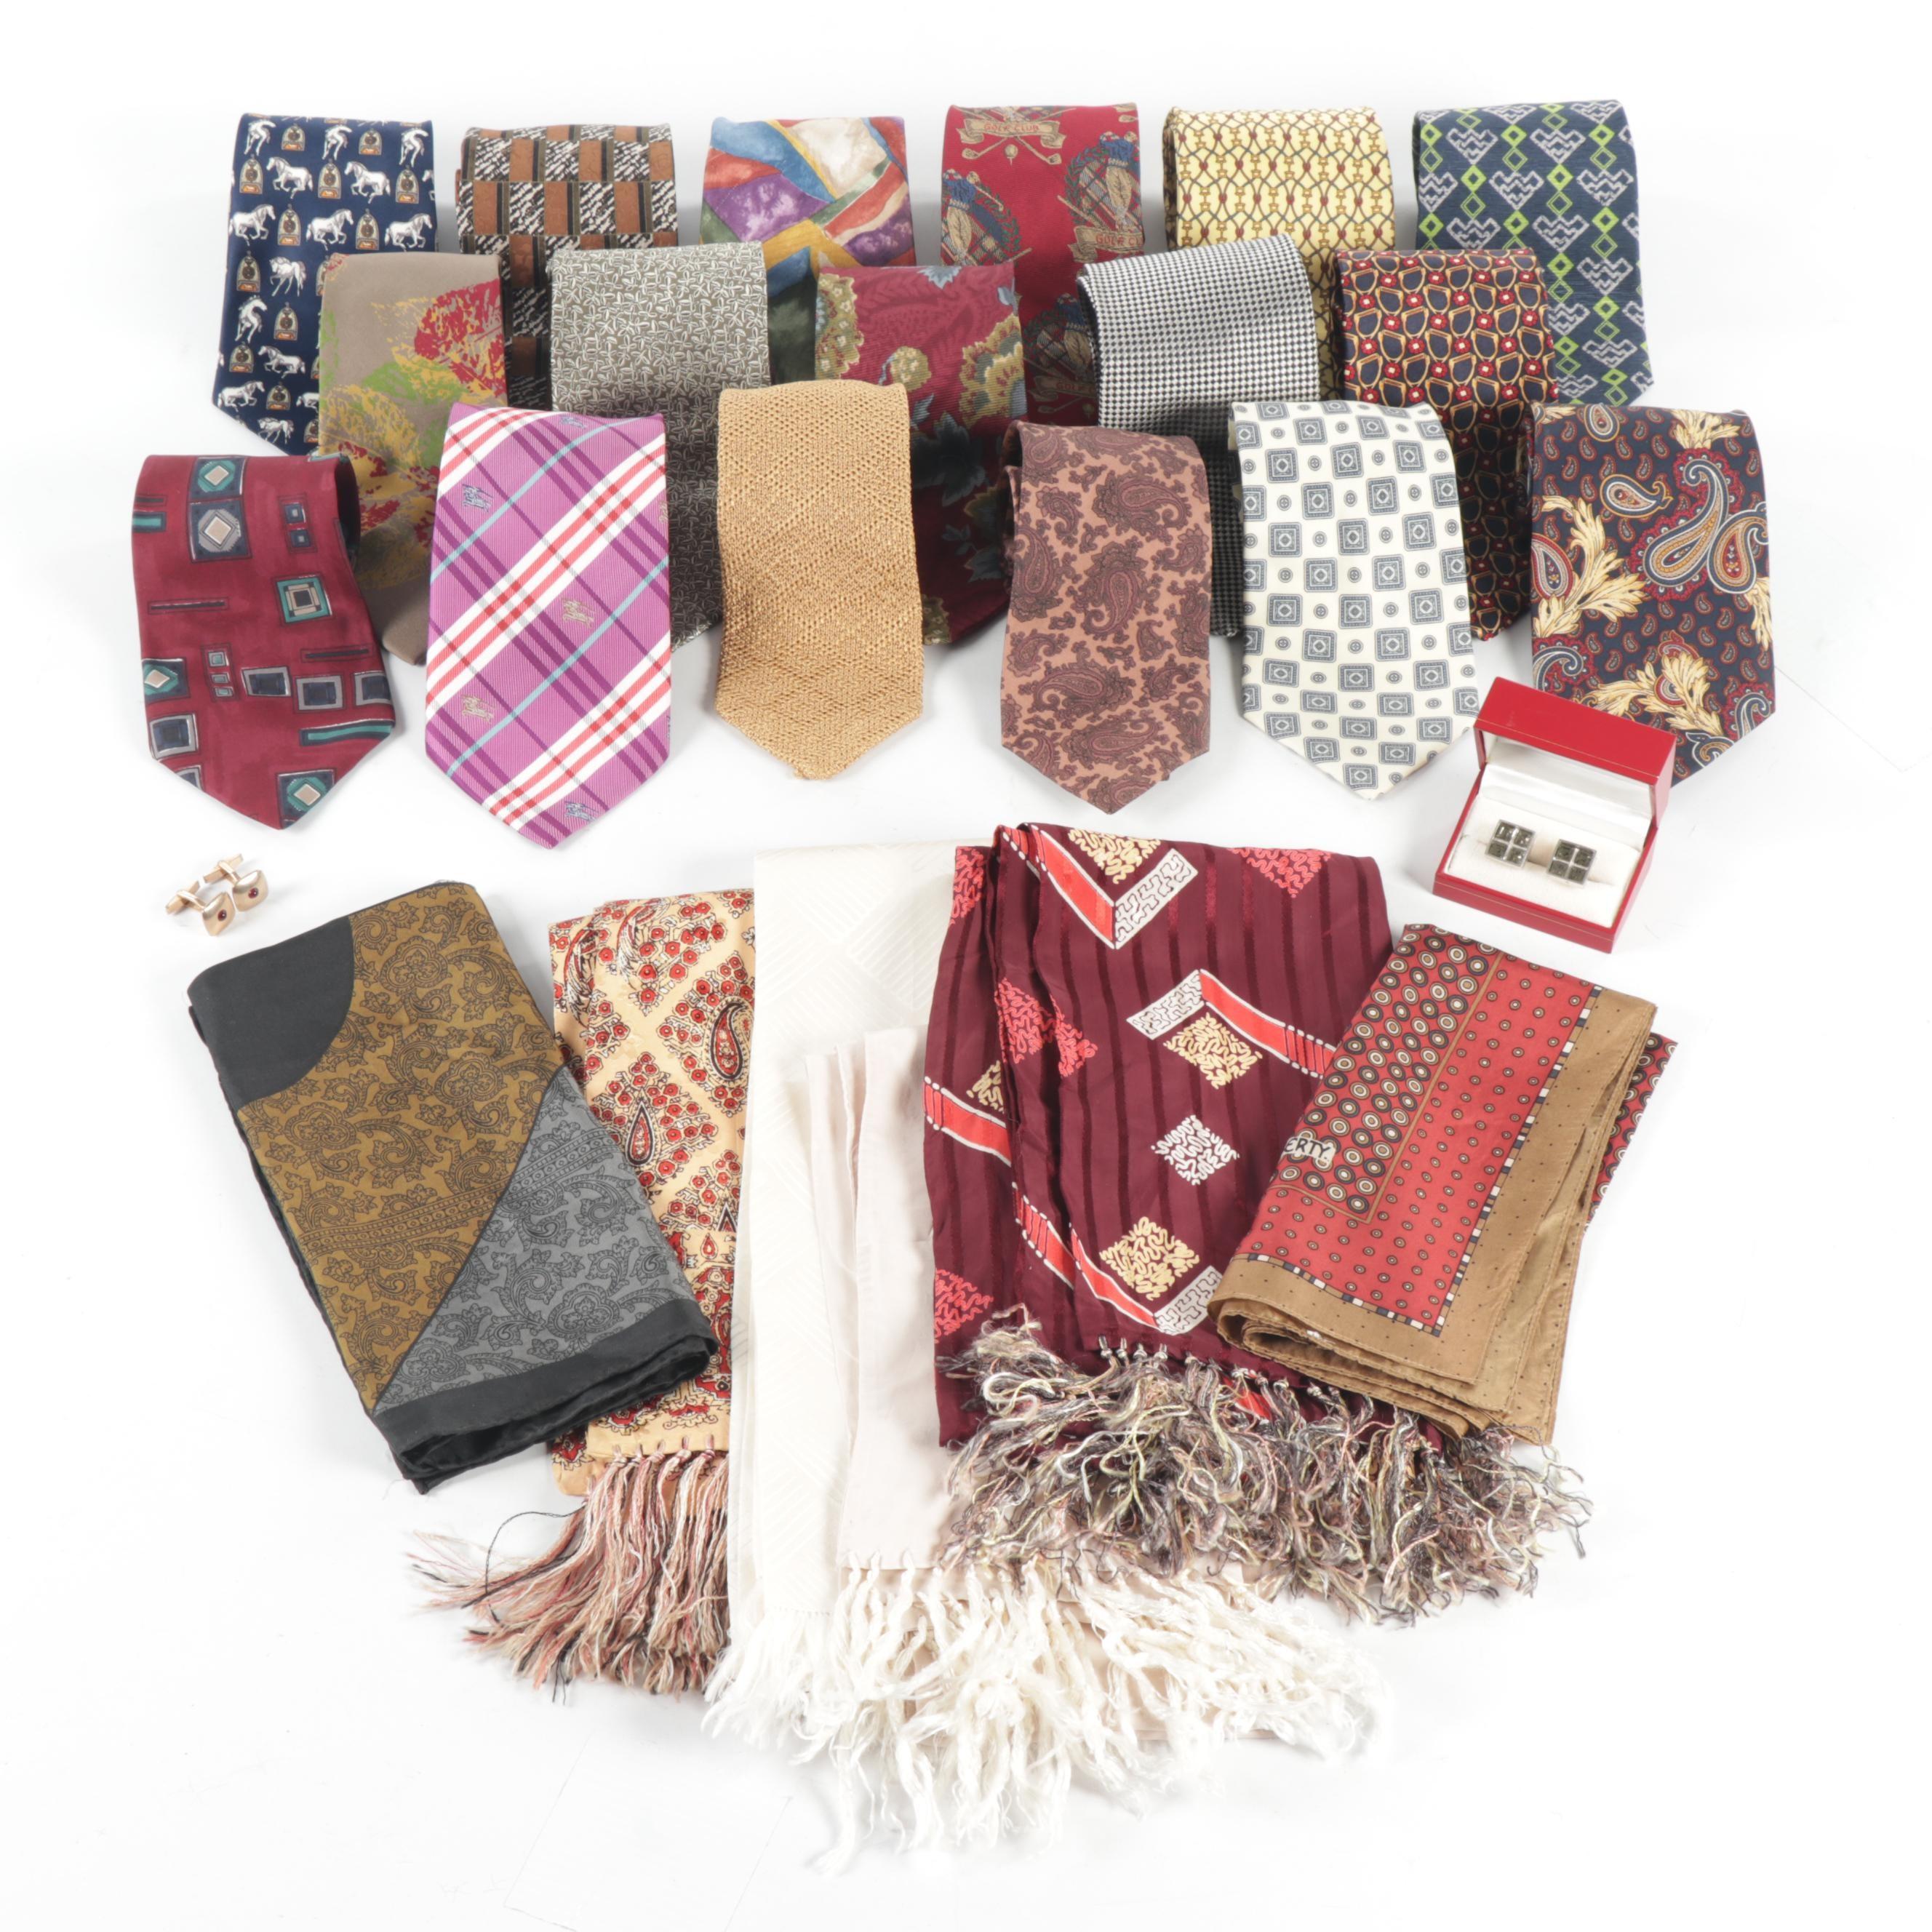 Men's Silk Ties and Accessories Including Oscar de la Renta, Burberry and More